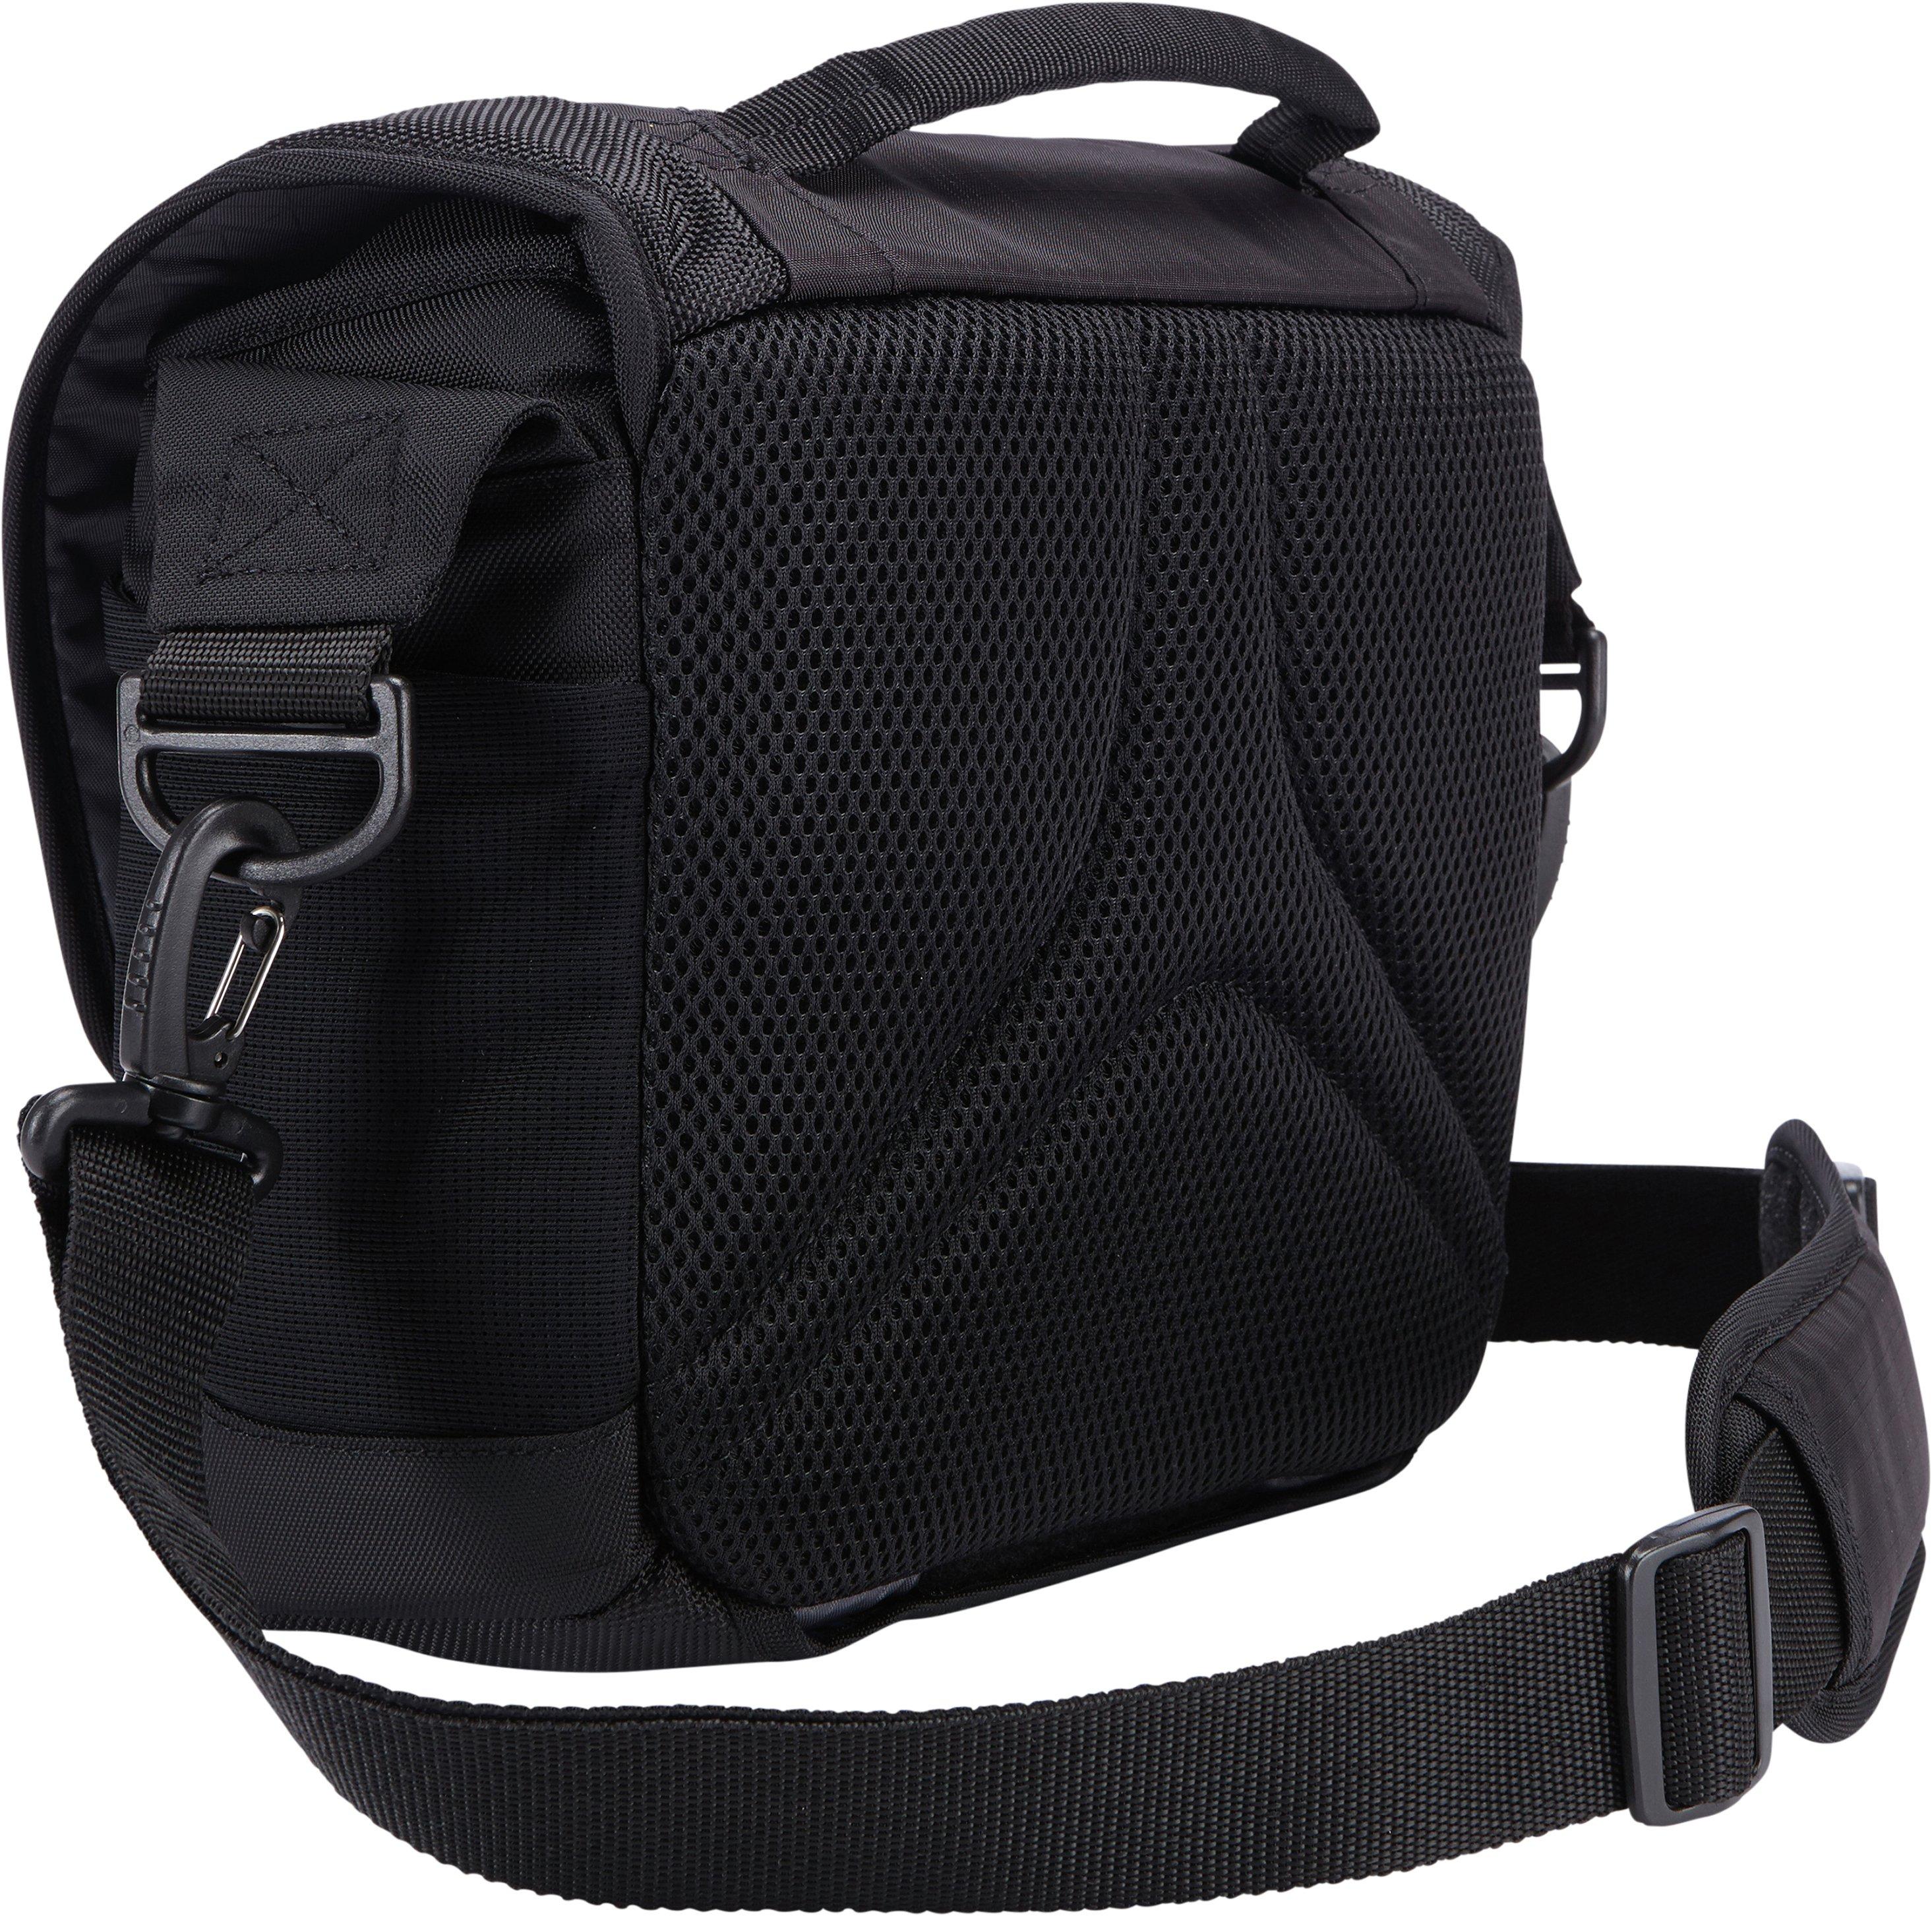 Image of Case Logic Luminosity DSLR CSC Camera Bag - Black.